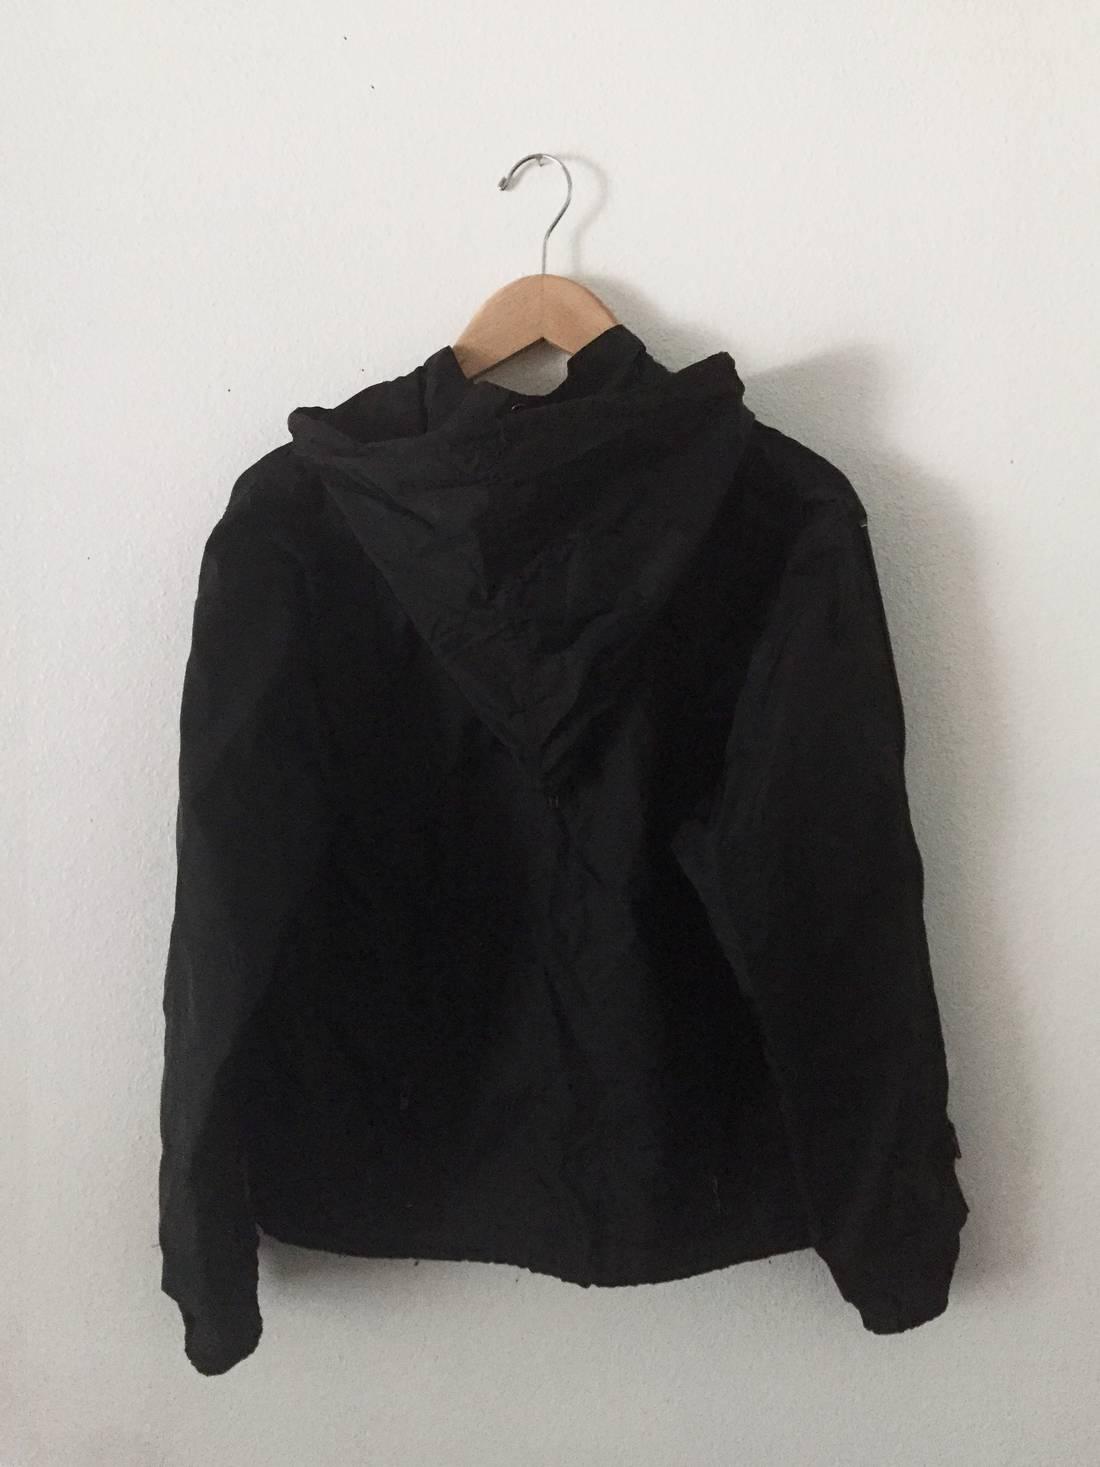 issey miyake black survival jacket size xxs raincoats for sale